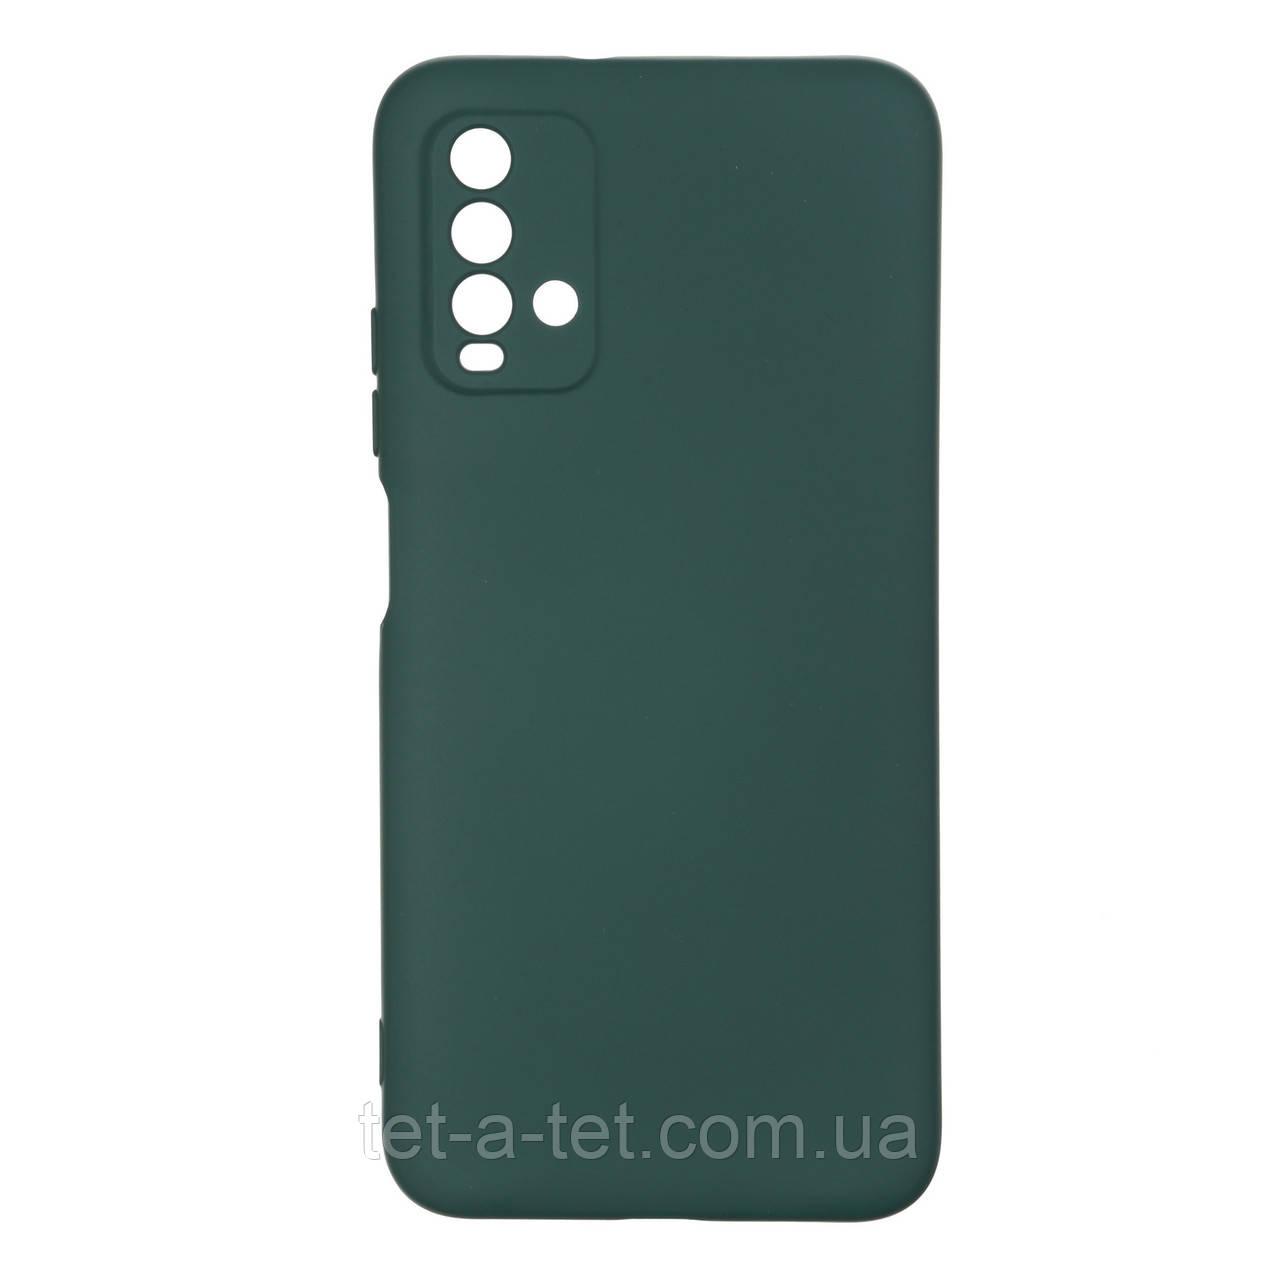 Чехол силиконовый ArmorStandart ICON Case for Xiaomi Redmi 9T Pine Green